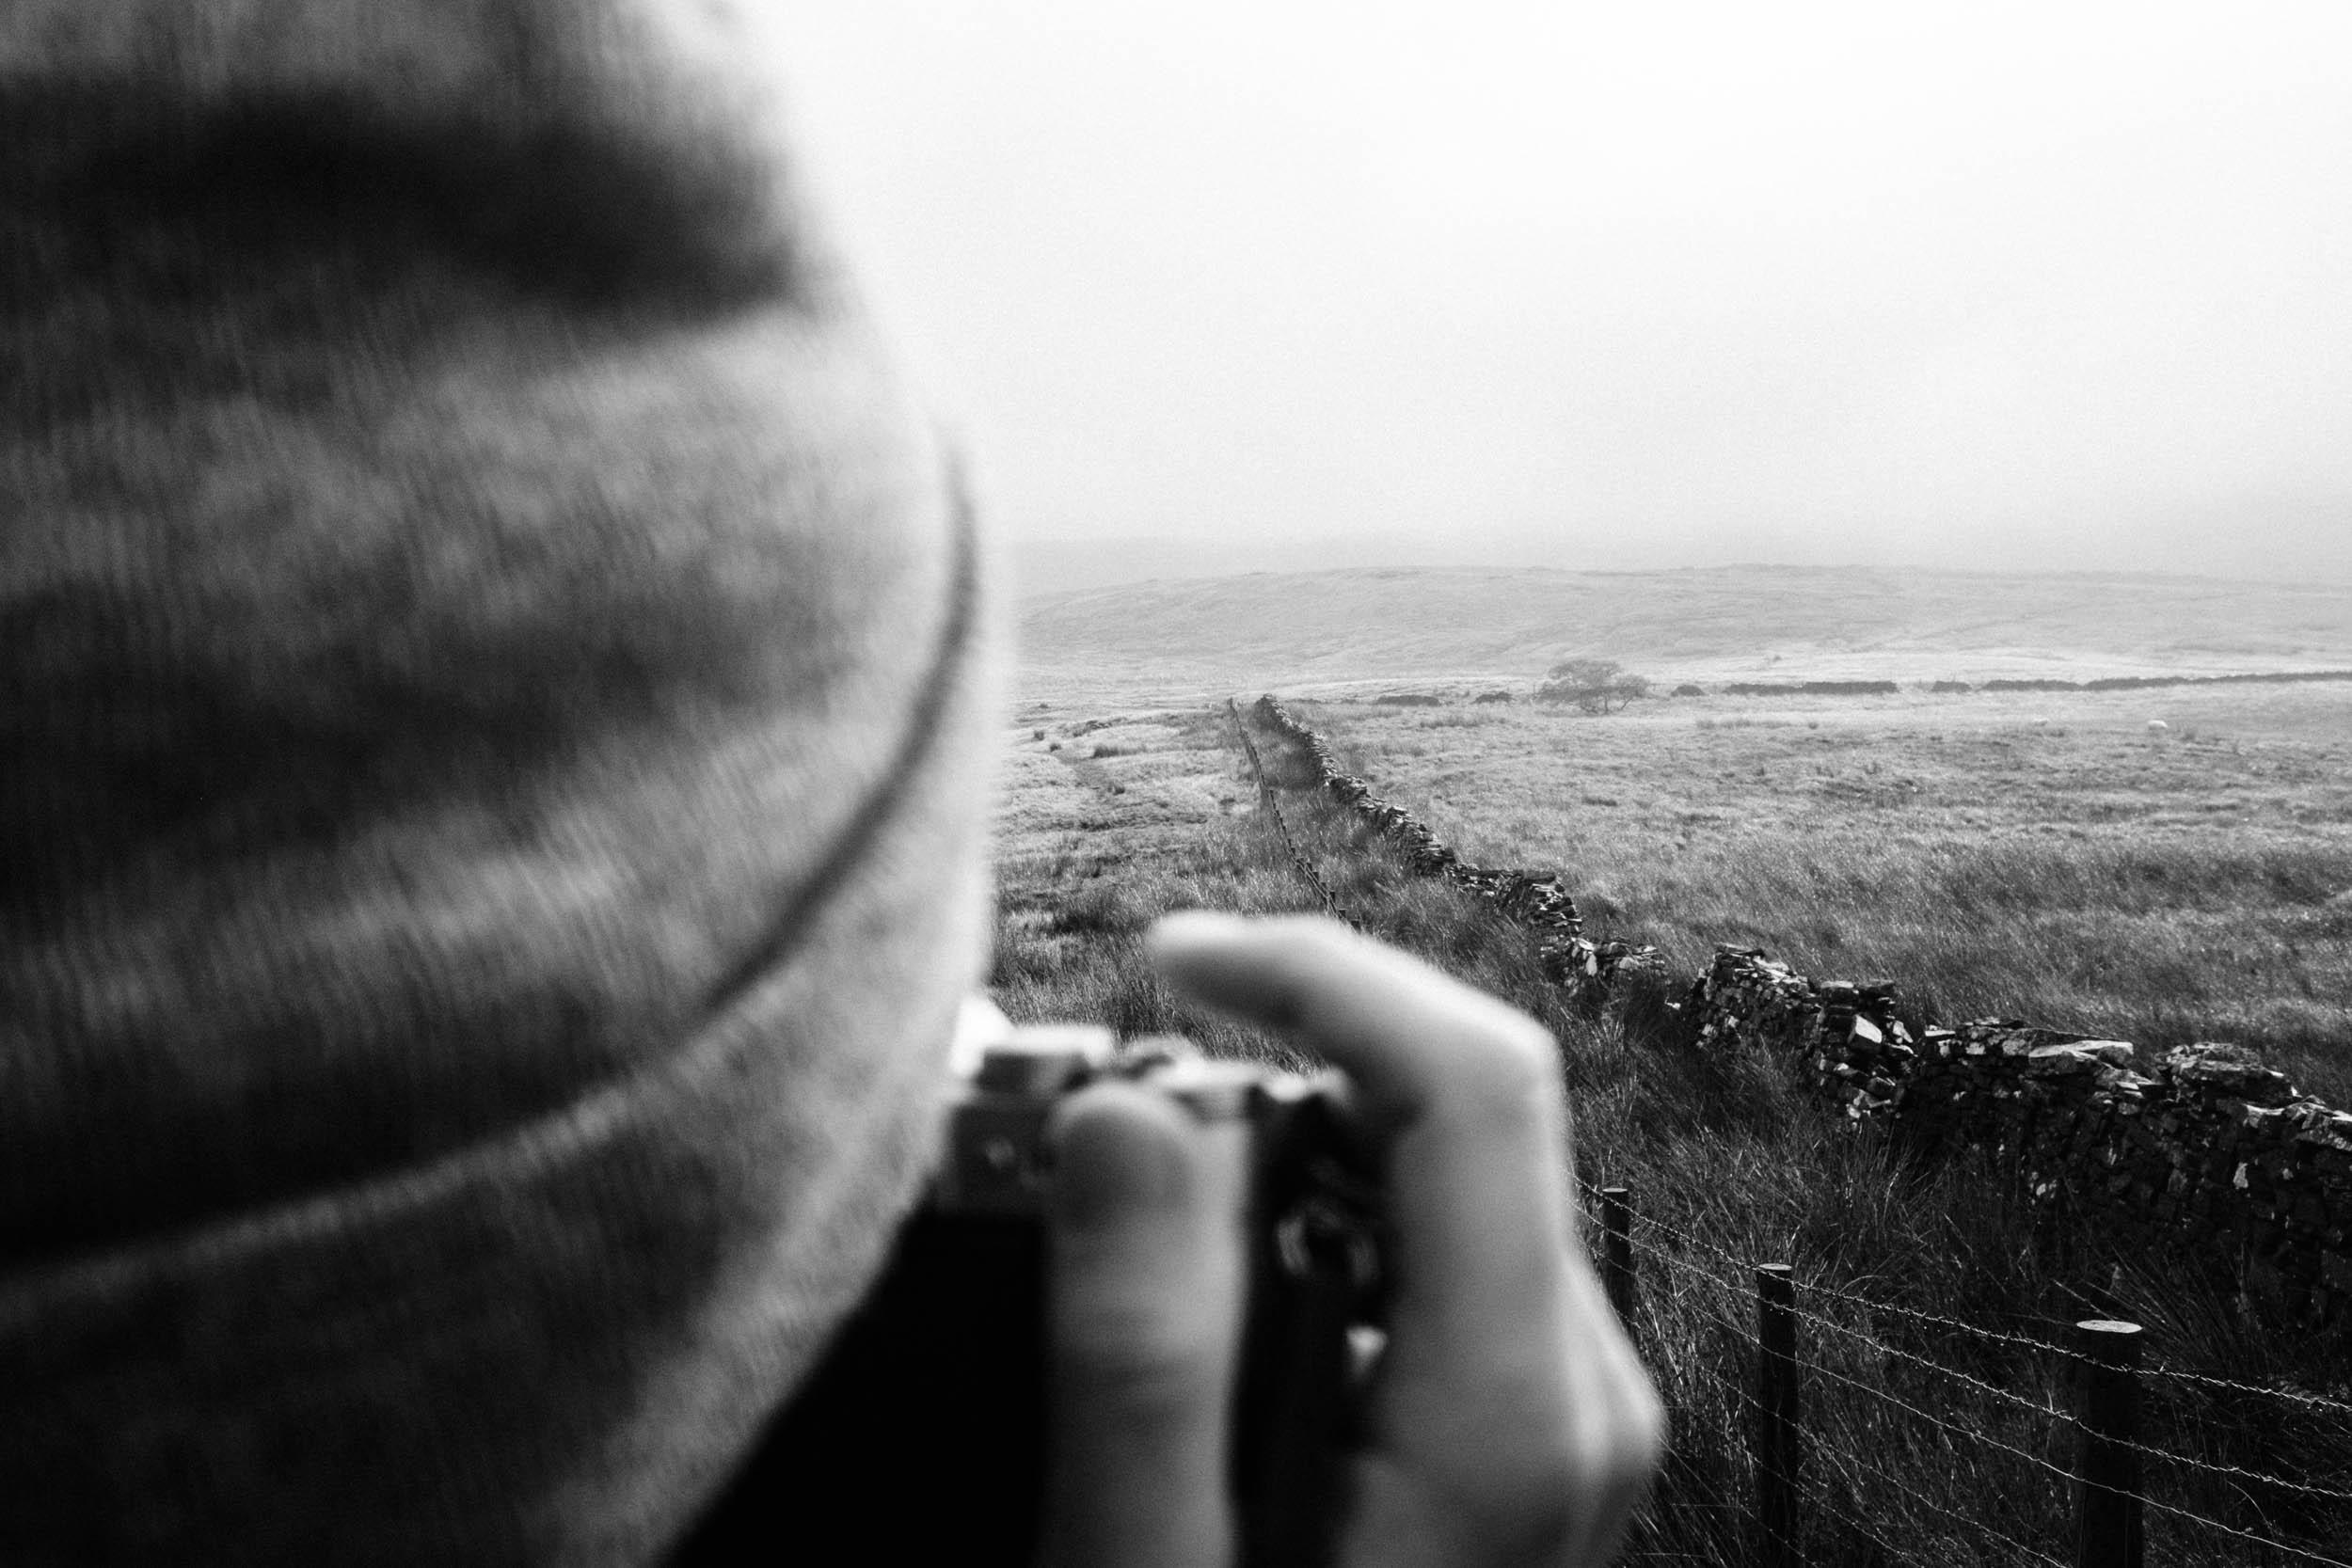 Alex_Sedgmond_Photography-BreconBeacons-SouthWales-LifestylePhotography-Wandering-13.jpg